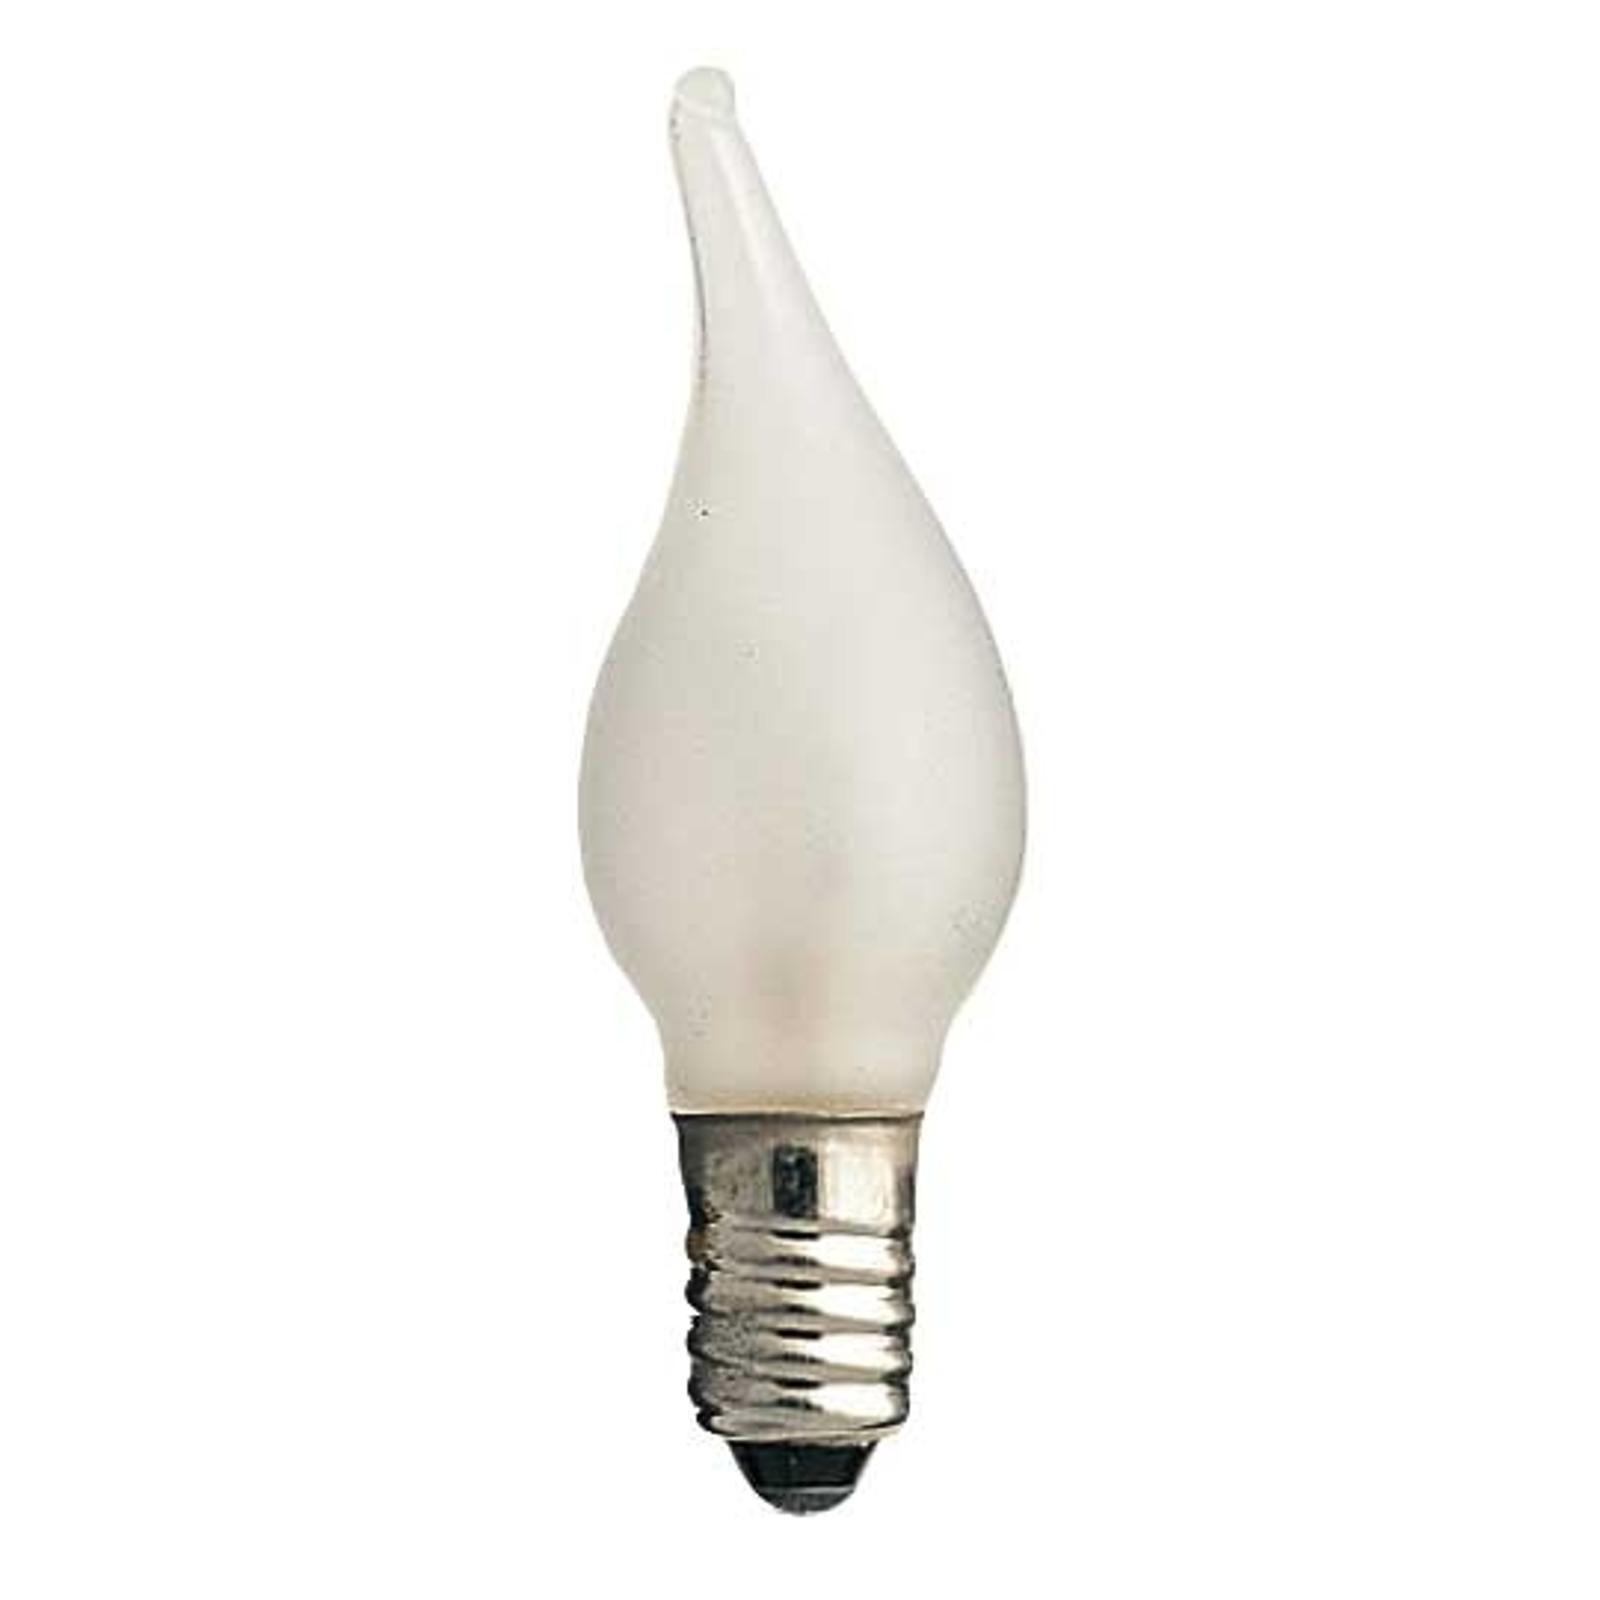 E10 3W 24V Ersatzlampen 3er Pack Windstoß